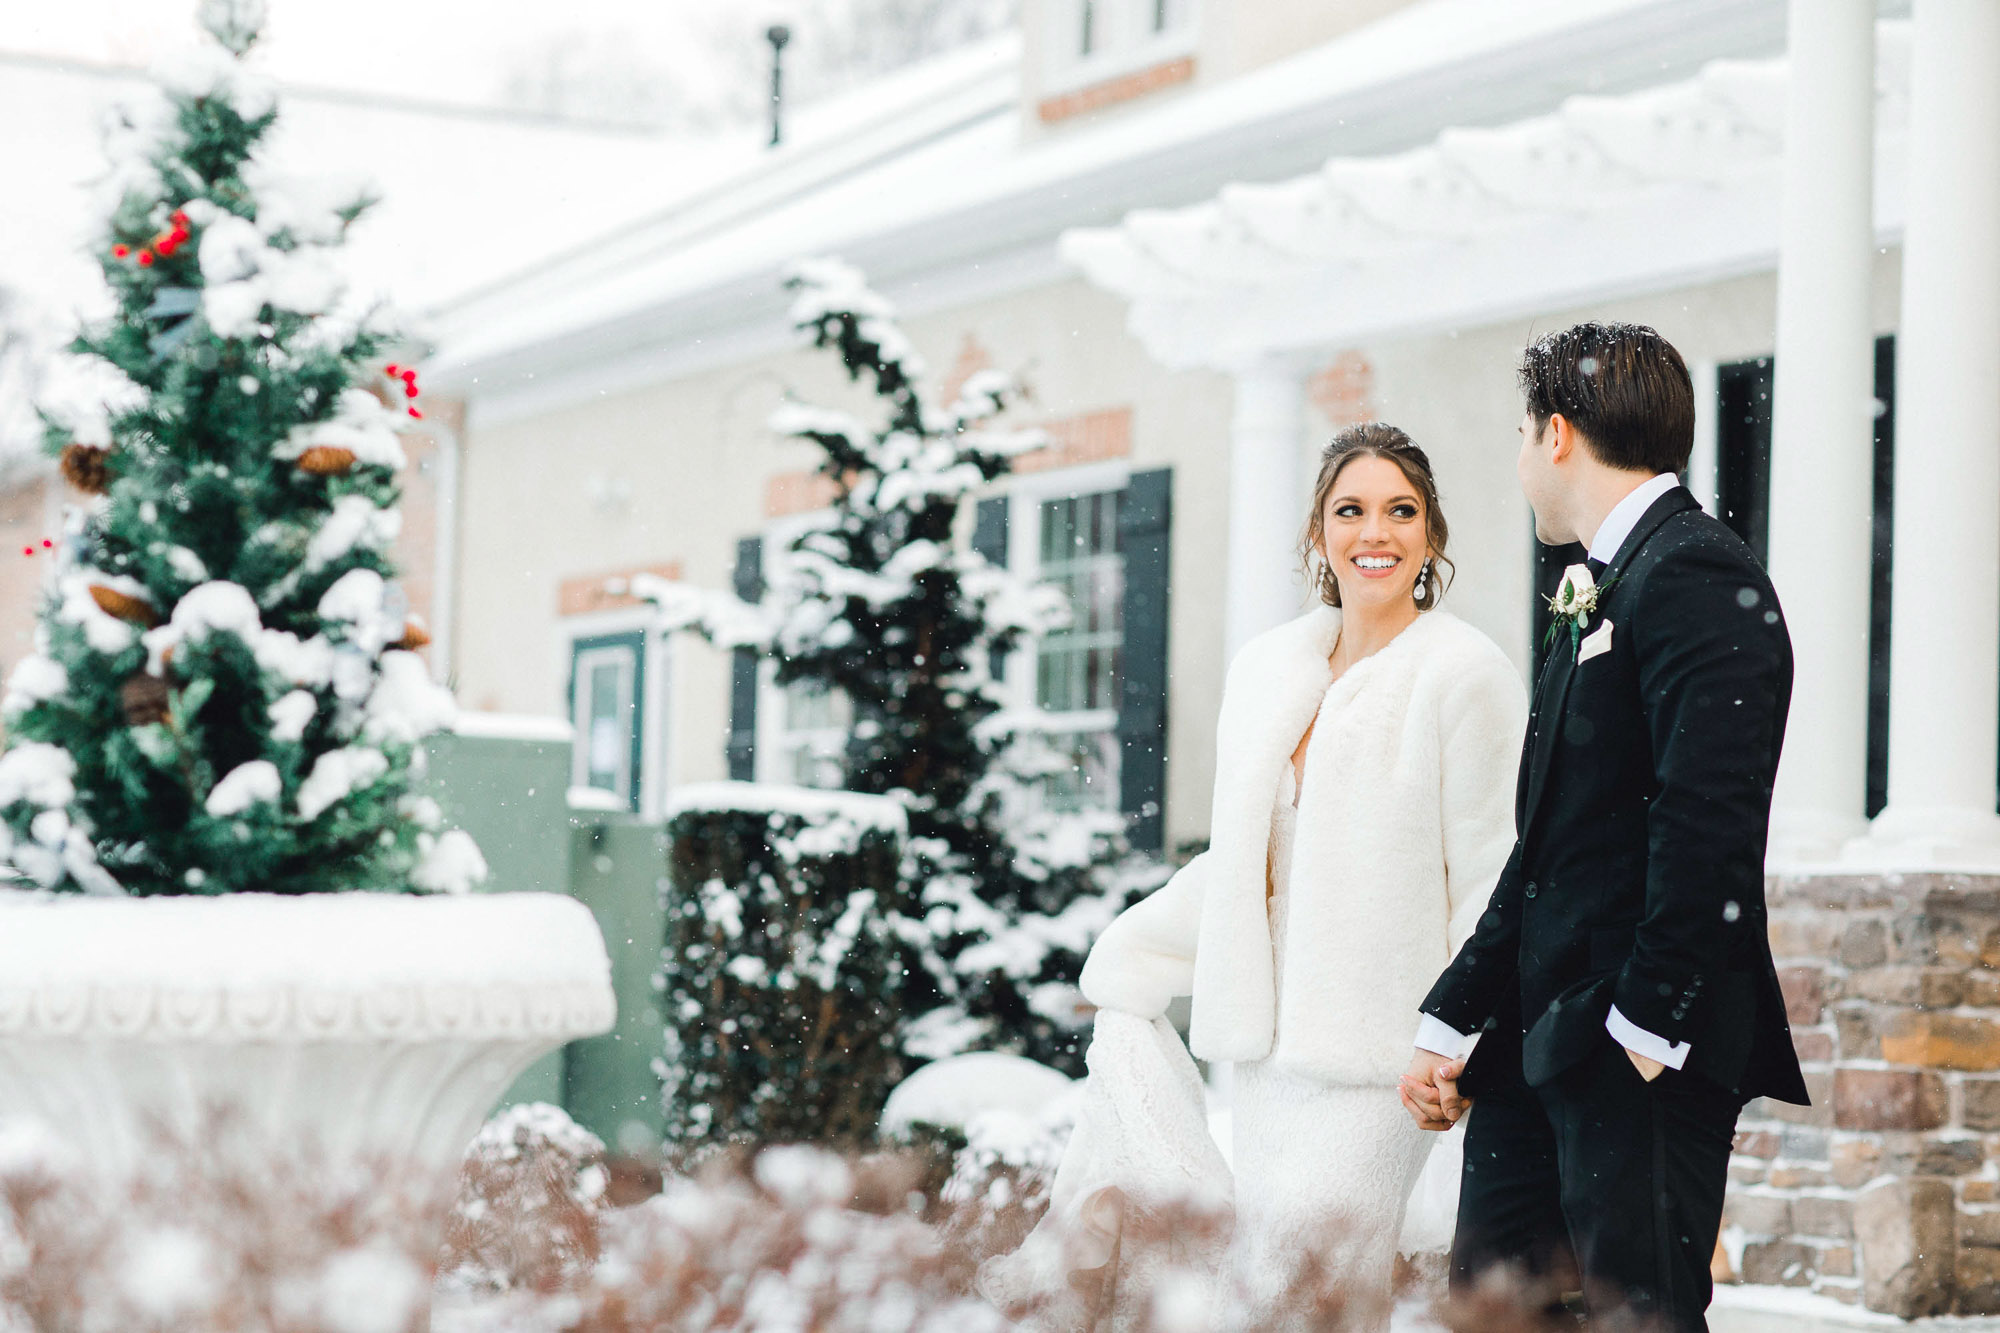 snowy-sand-springs-country-club-drums-pa-christmas-wedding-24665.jpg